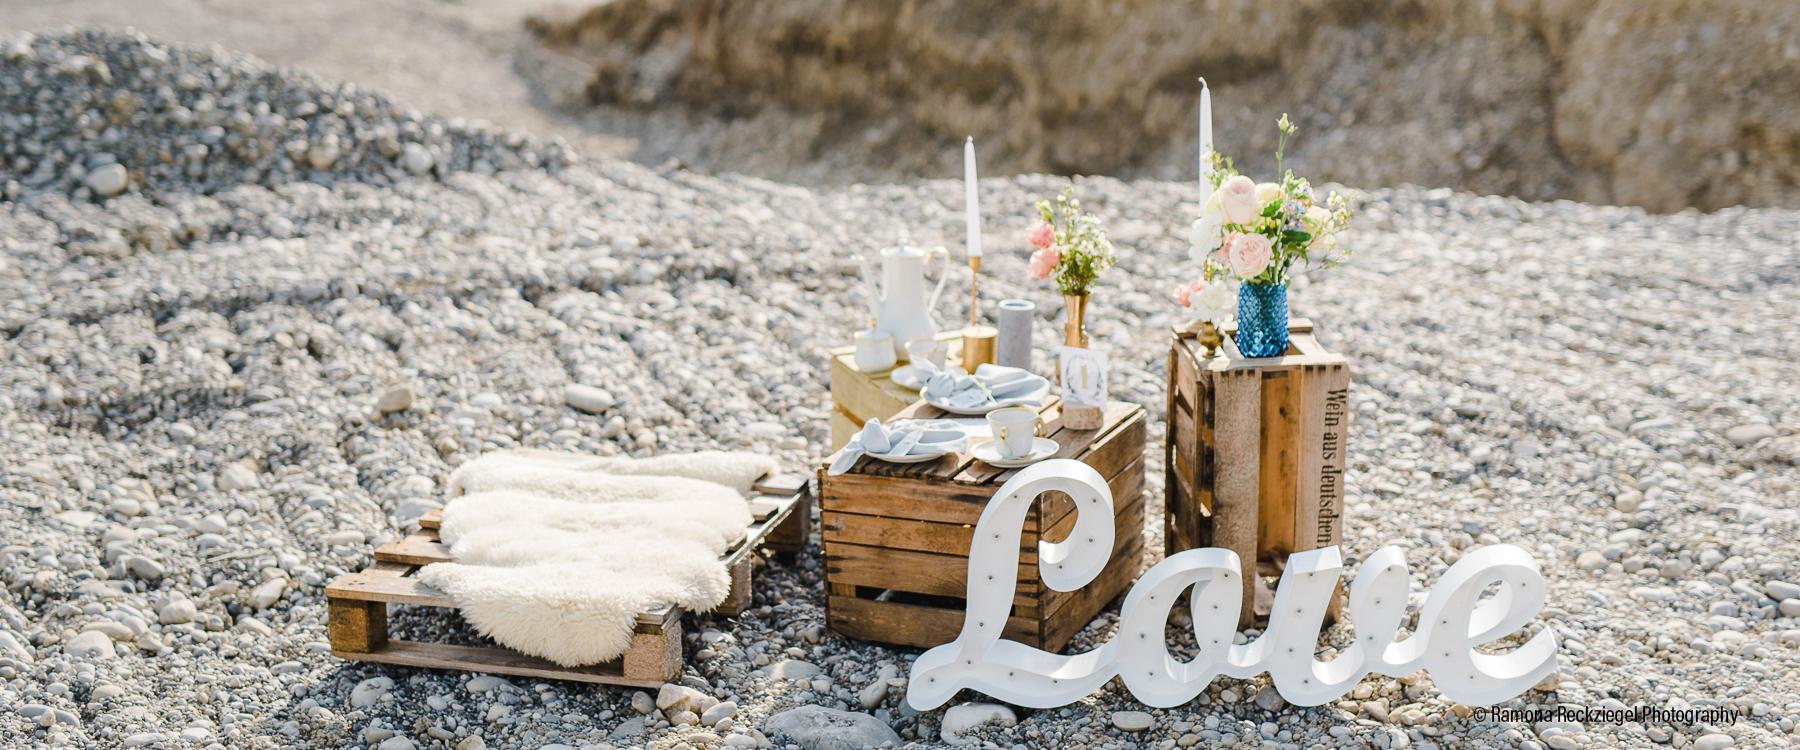 wedding-fotos-cinema-rrp-8729.jpg